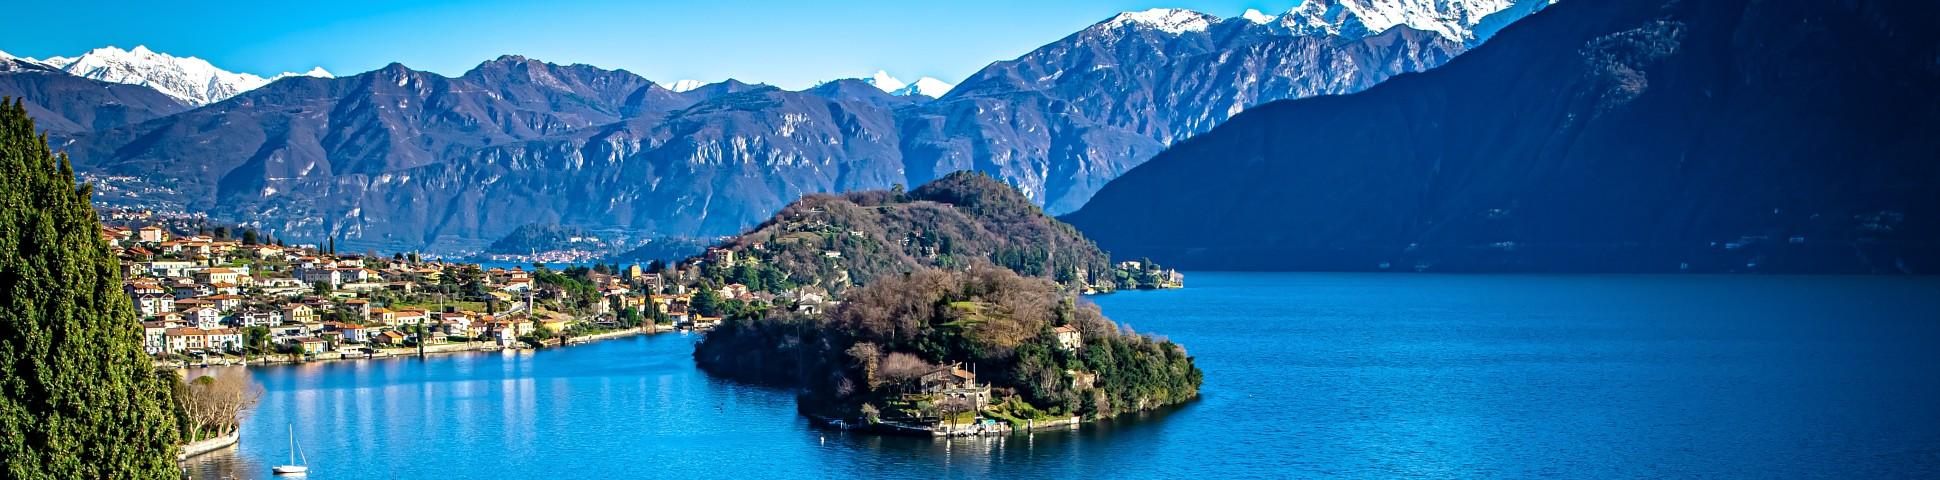 Lake Como in Italy